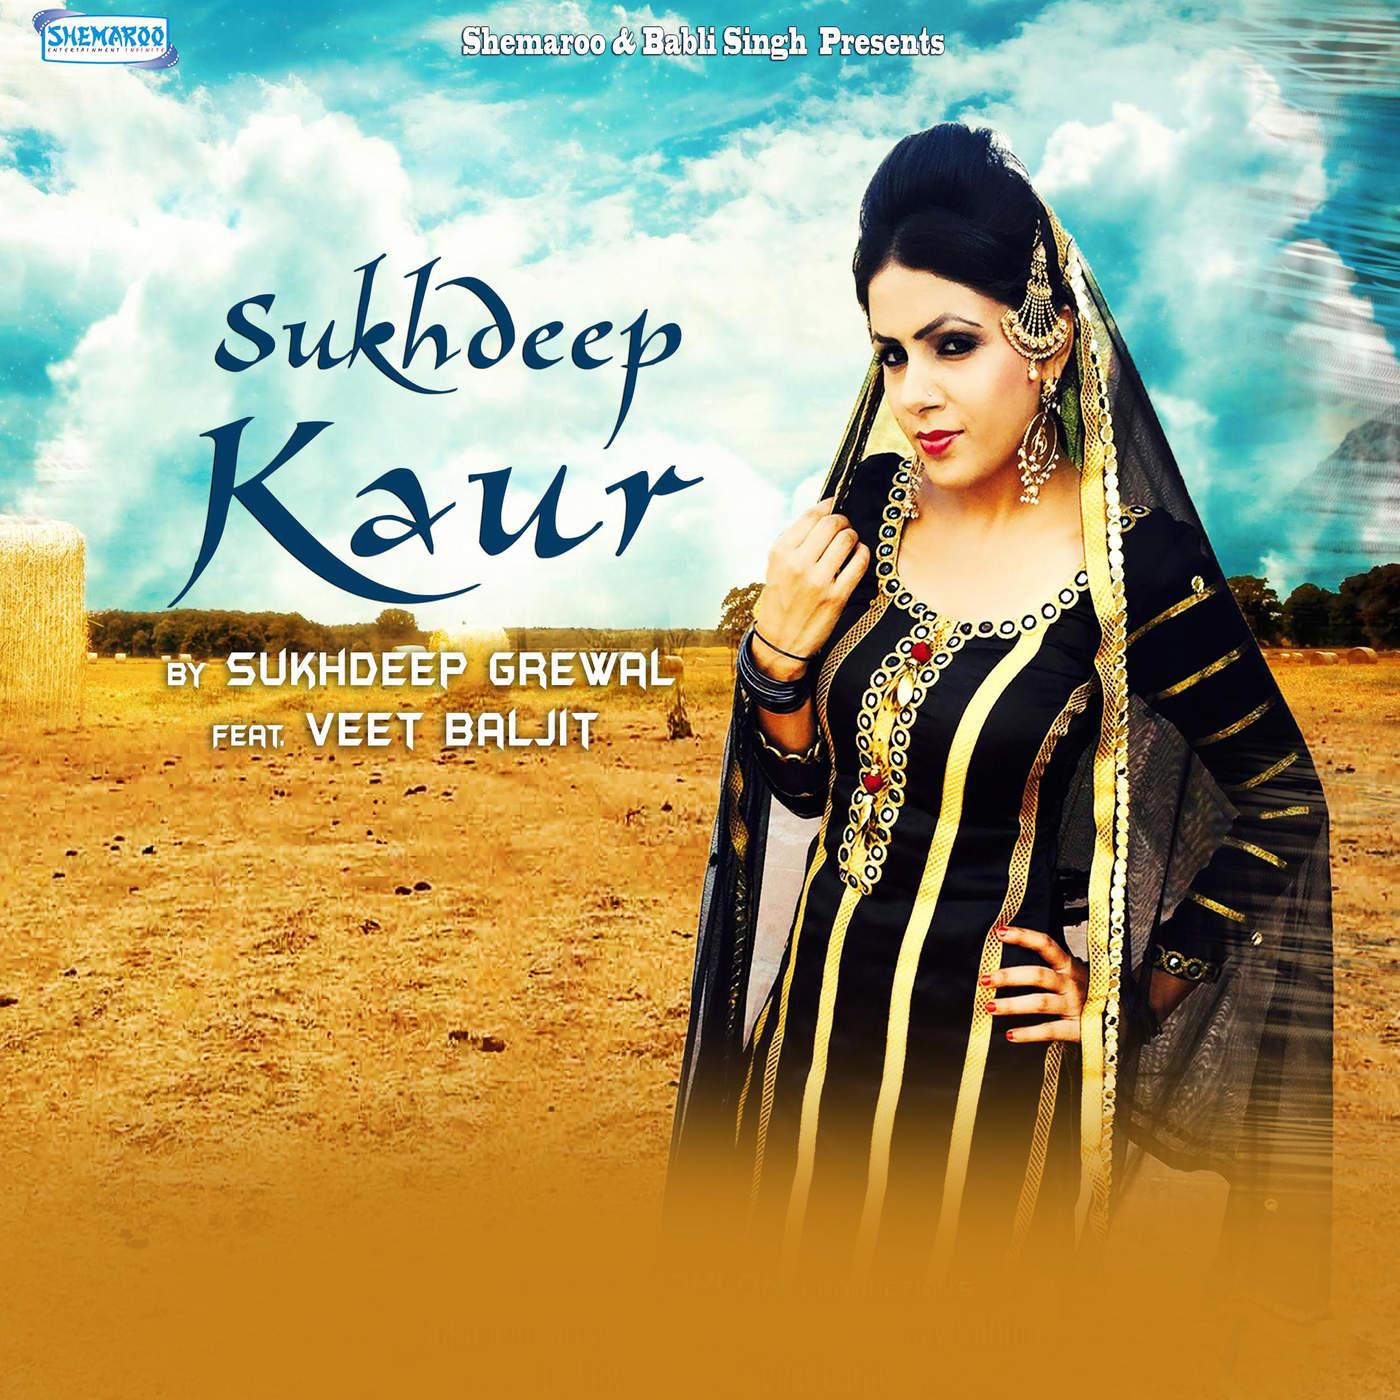 Jatt War - Gur Sidhu, Jai Bhullar mp3